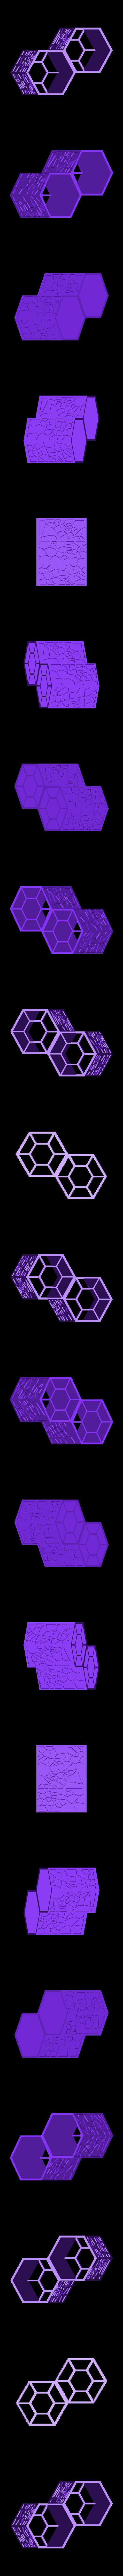 voronoi_dual_hex_module.stl Download free STL file Modular Hex Drawers • Design to 3D print, O3D